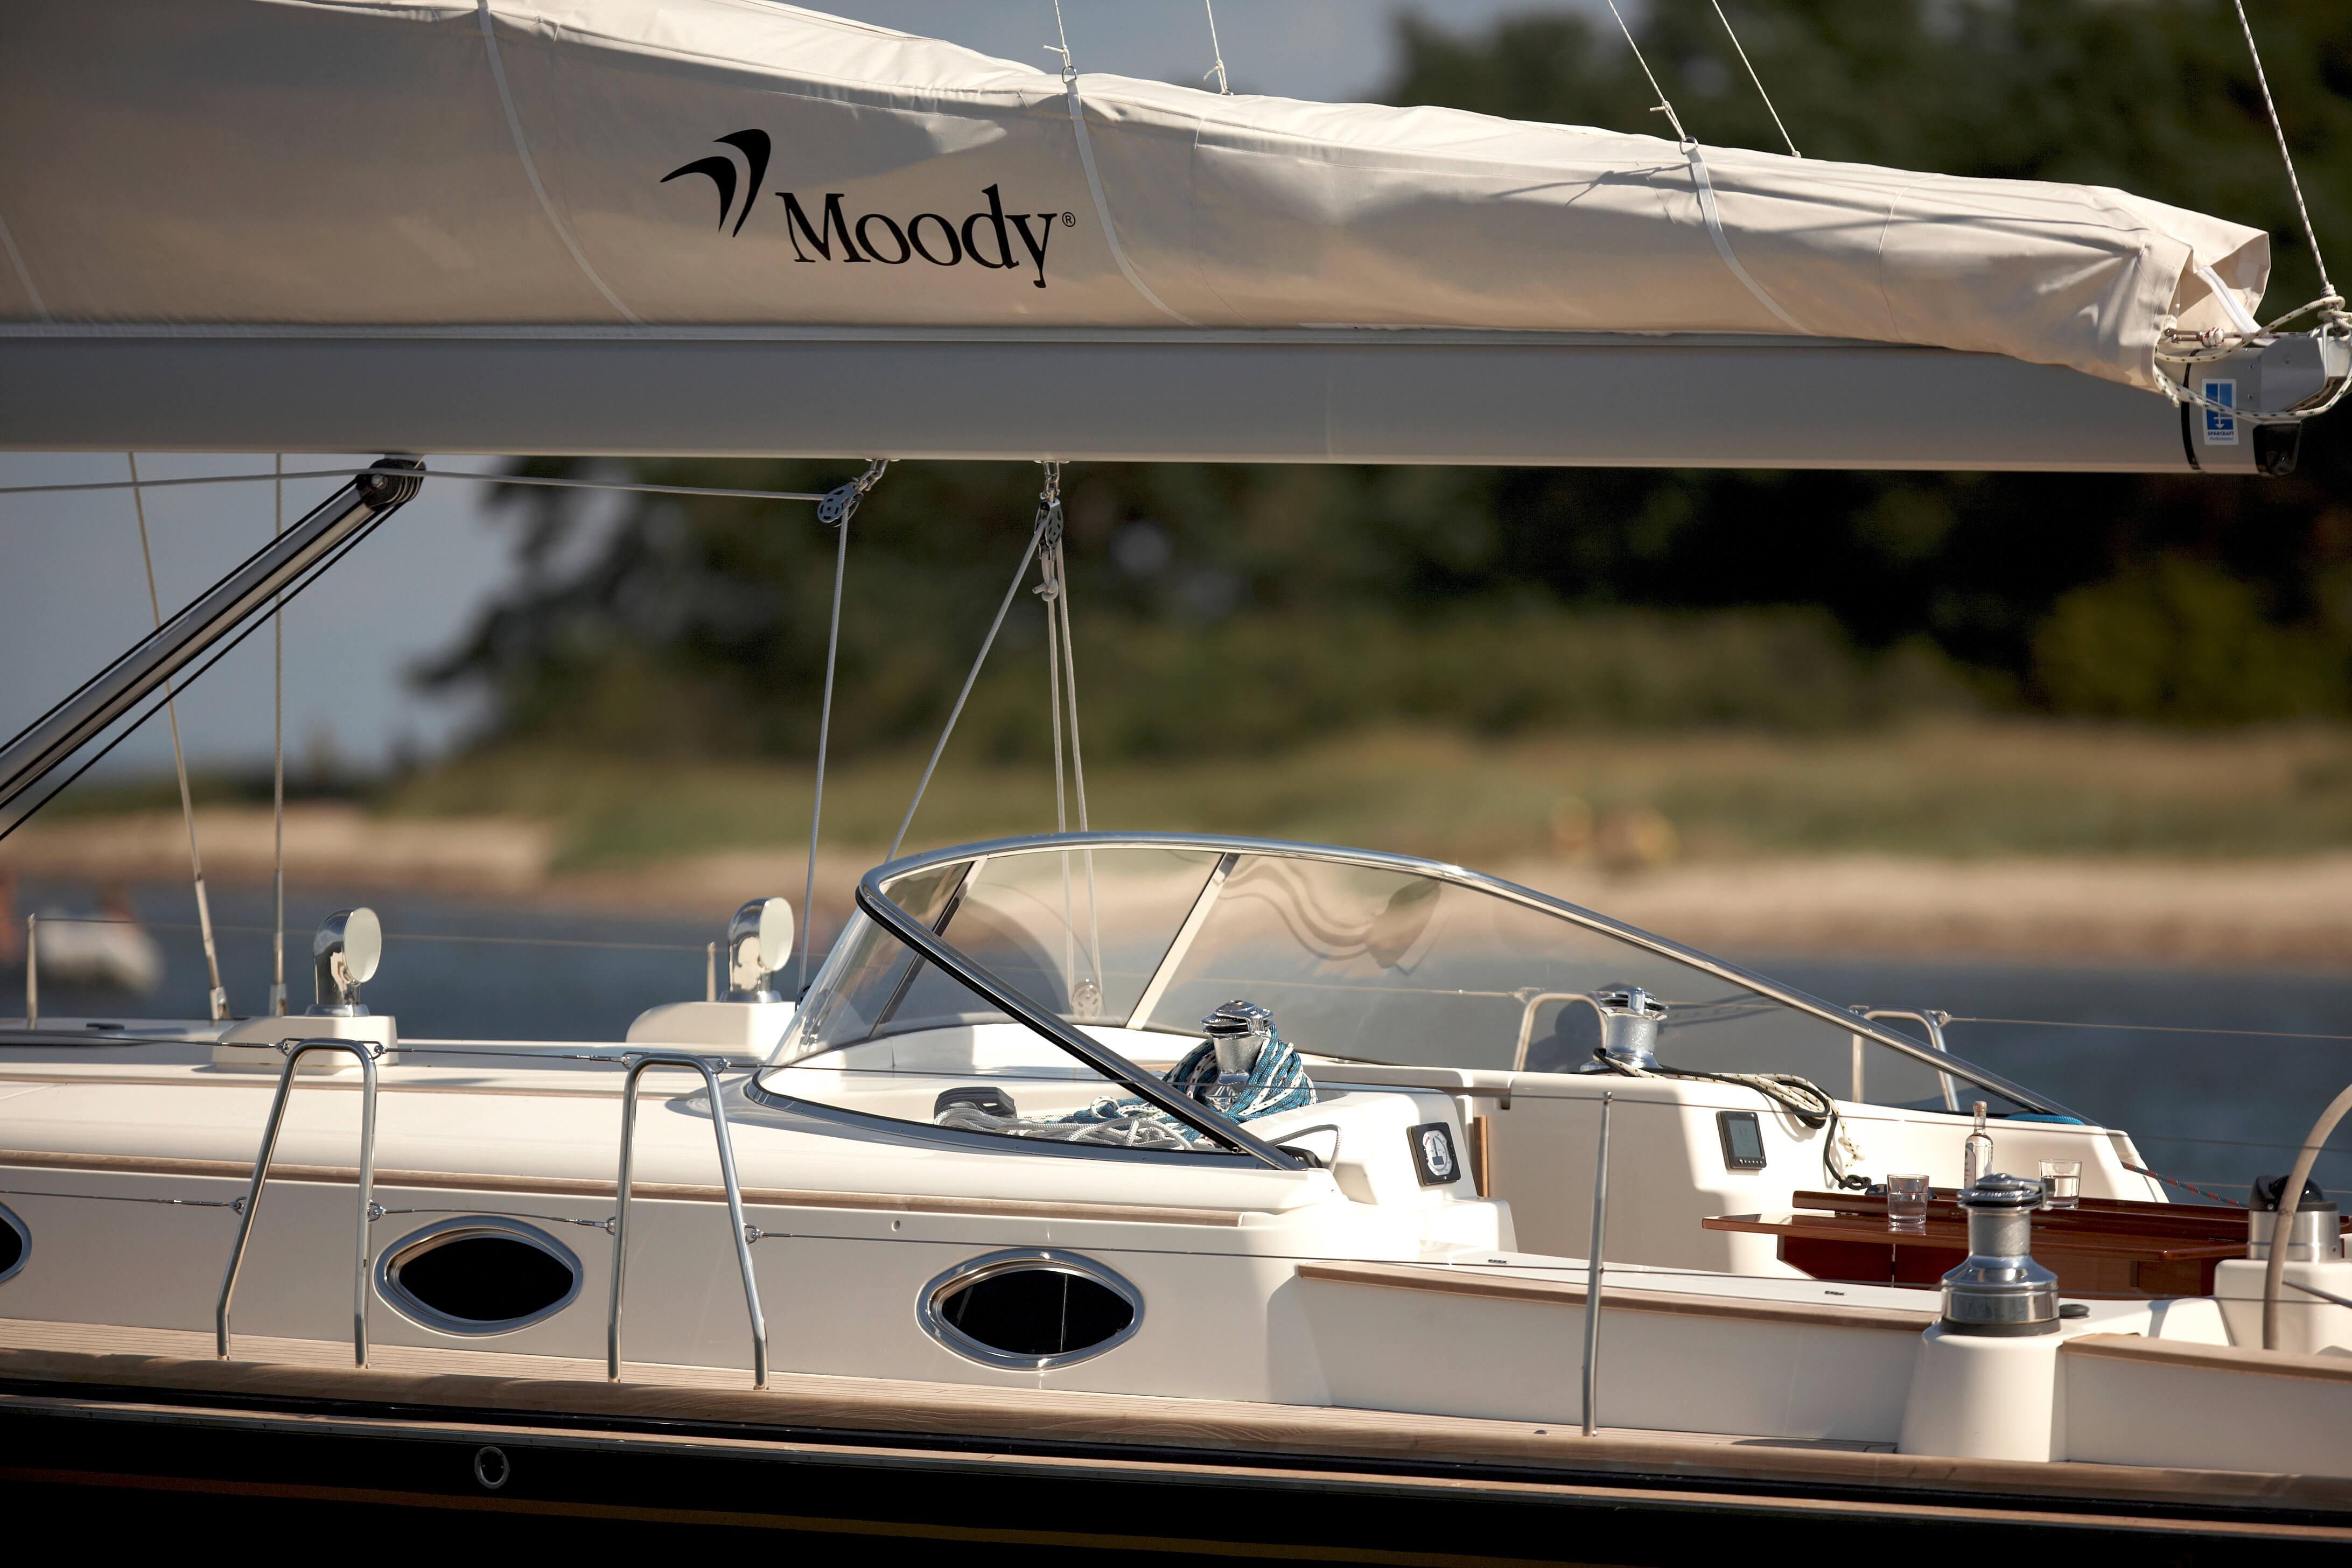 Moody Aft Cockpit 45 Exterieur | Moody